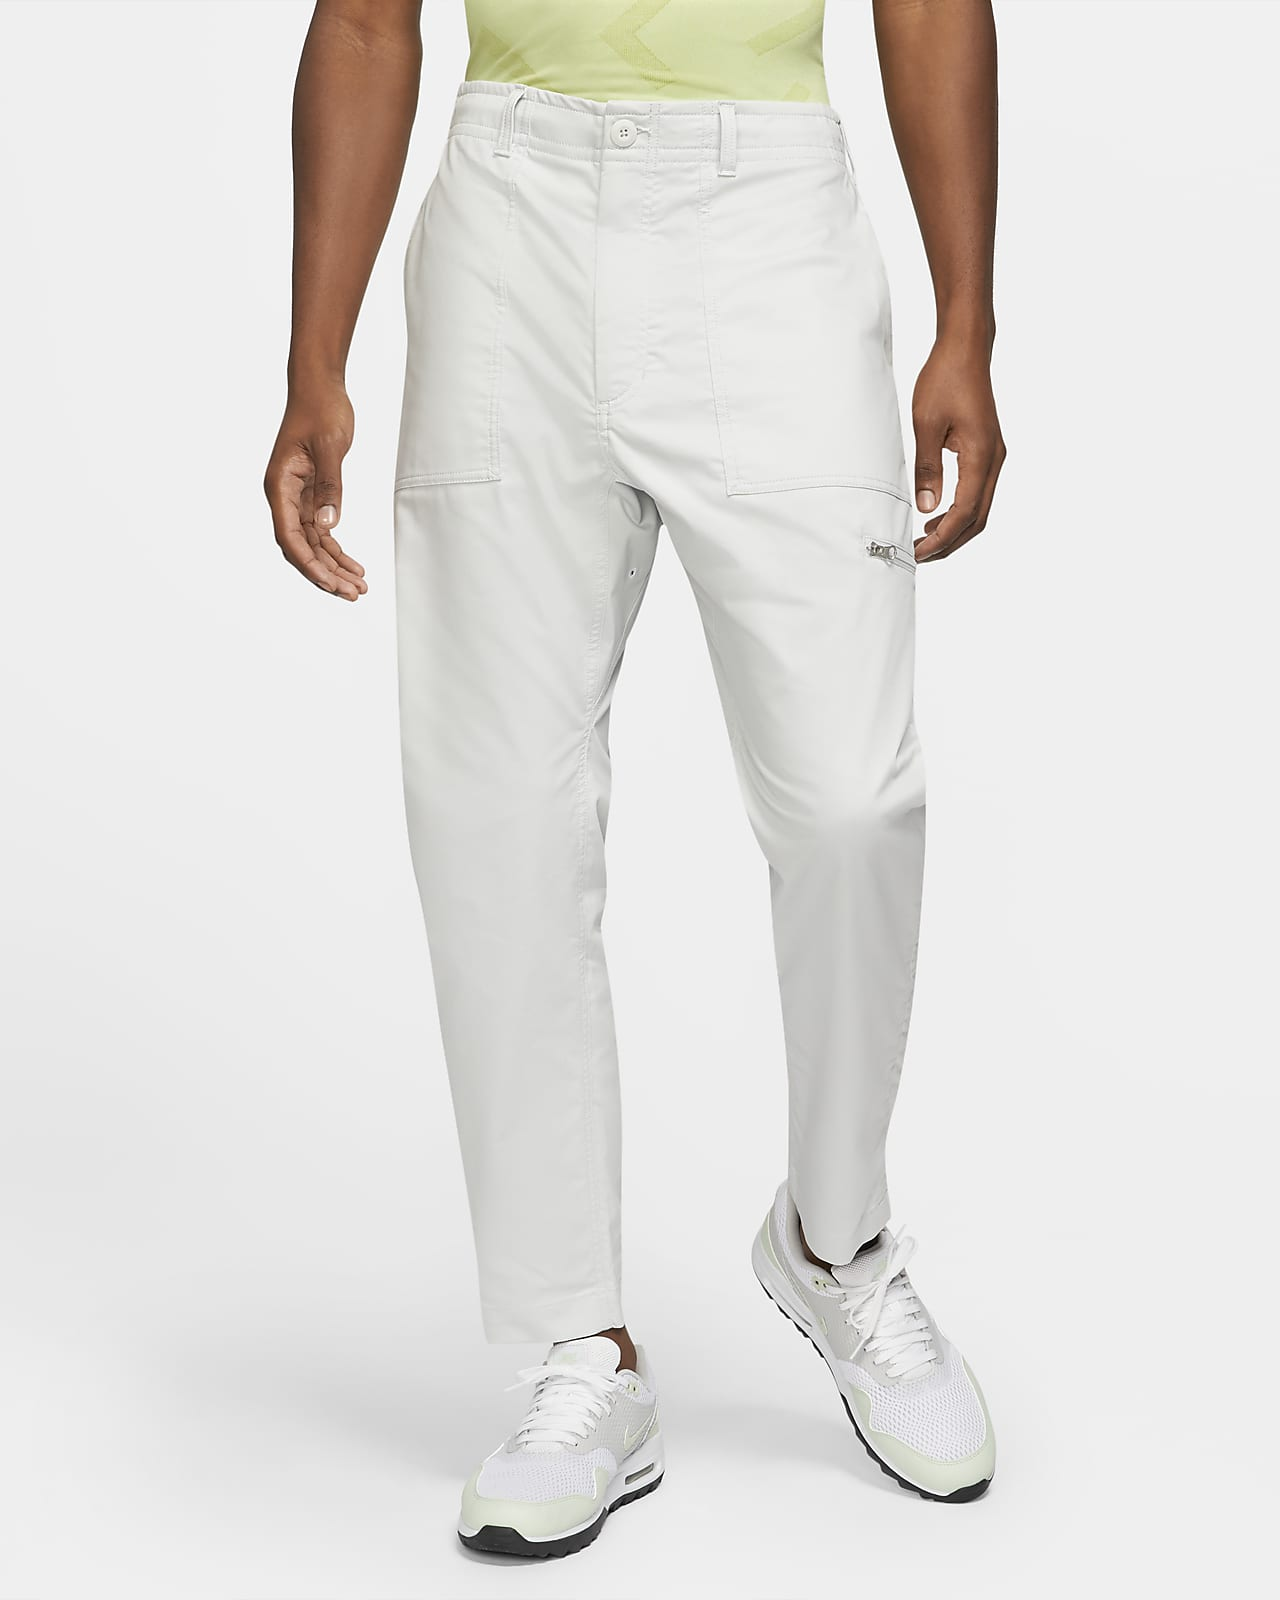 Nike Dri-FIT Men's Golf Pants